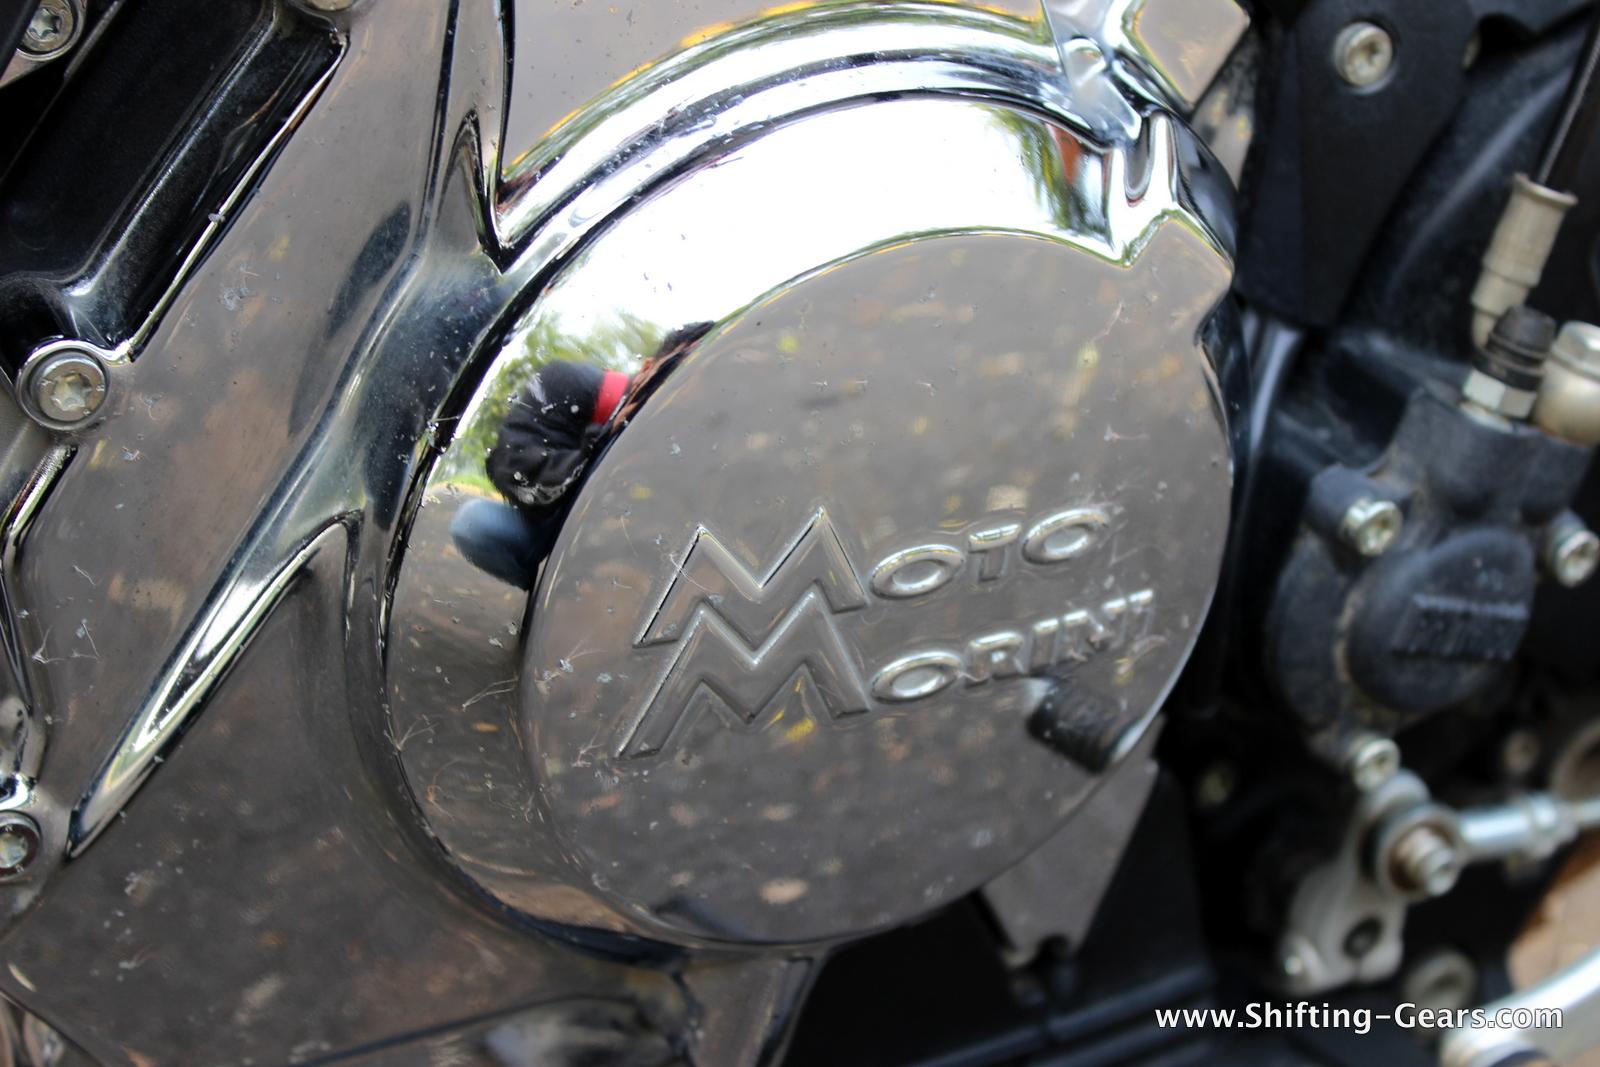 Moto Morini written on the engine case